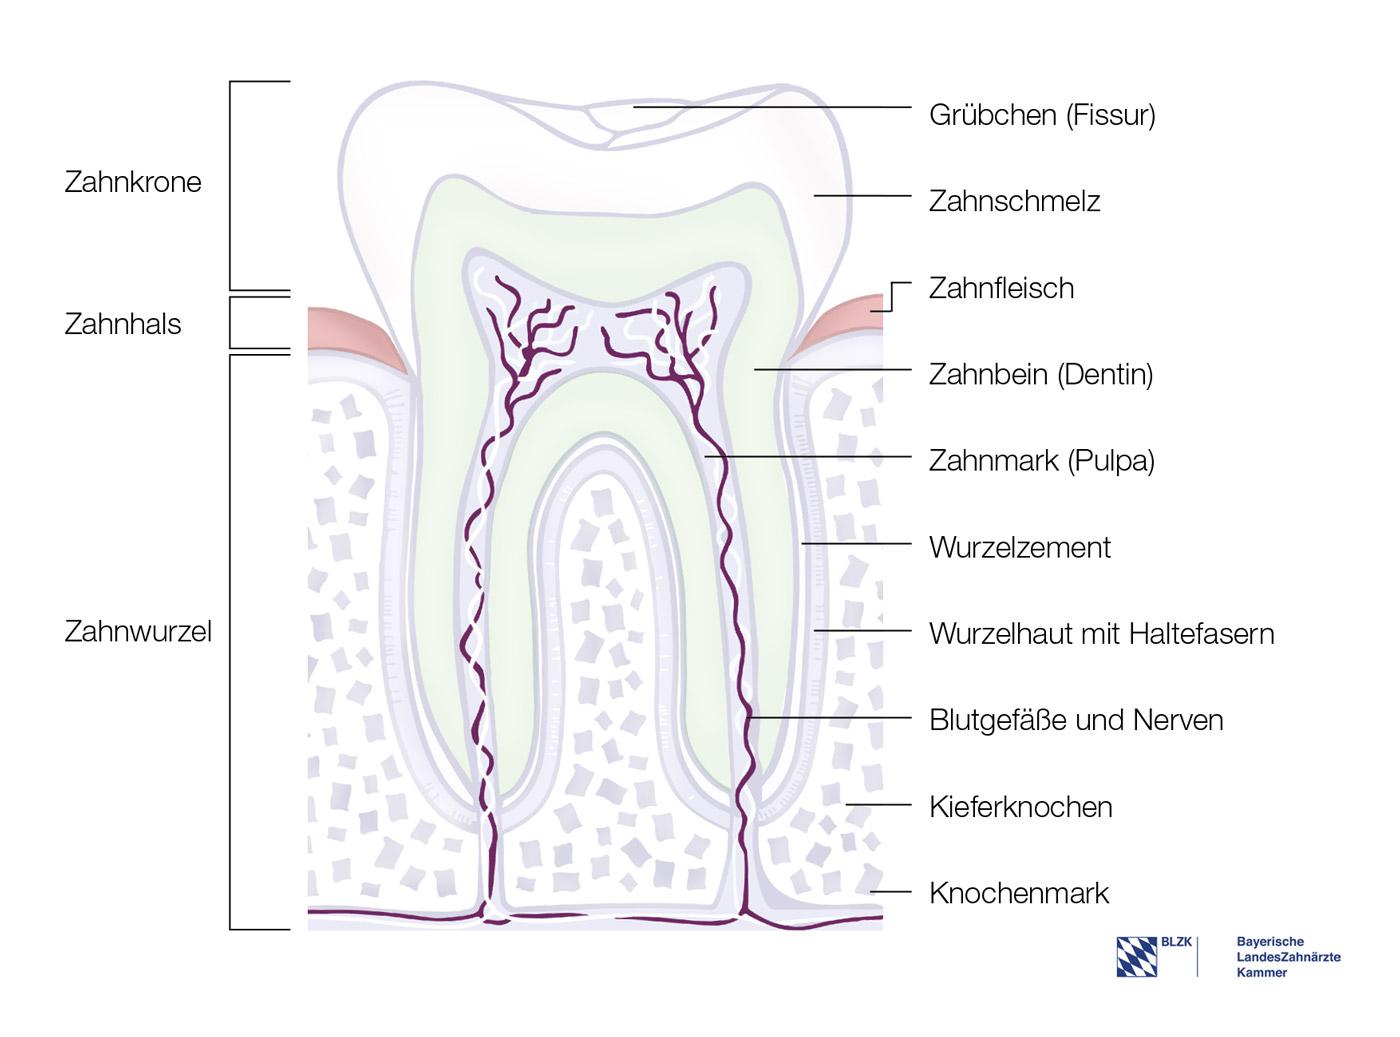 Großzügig Zahnanatomie Diagramm Ideen - Anatomie Ideen - finotti.info